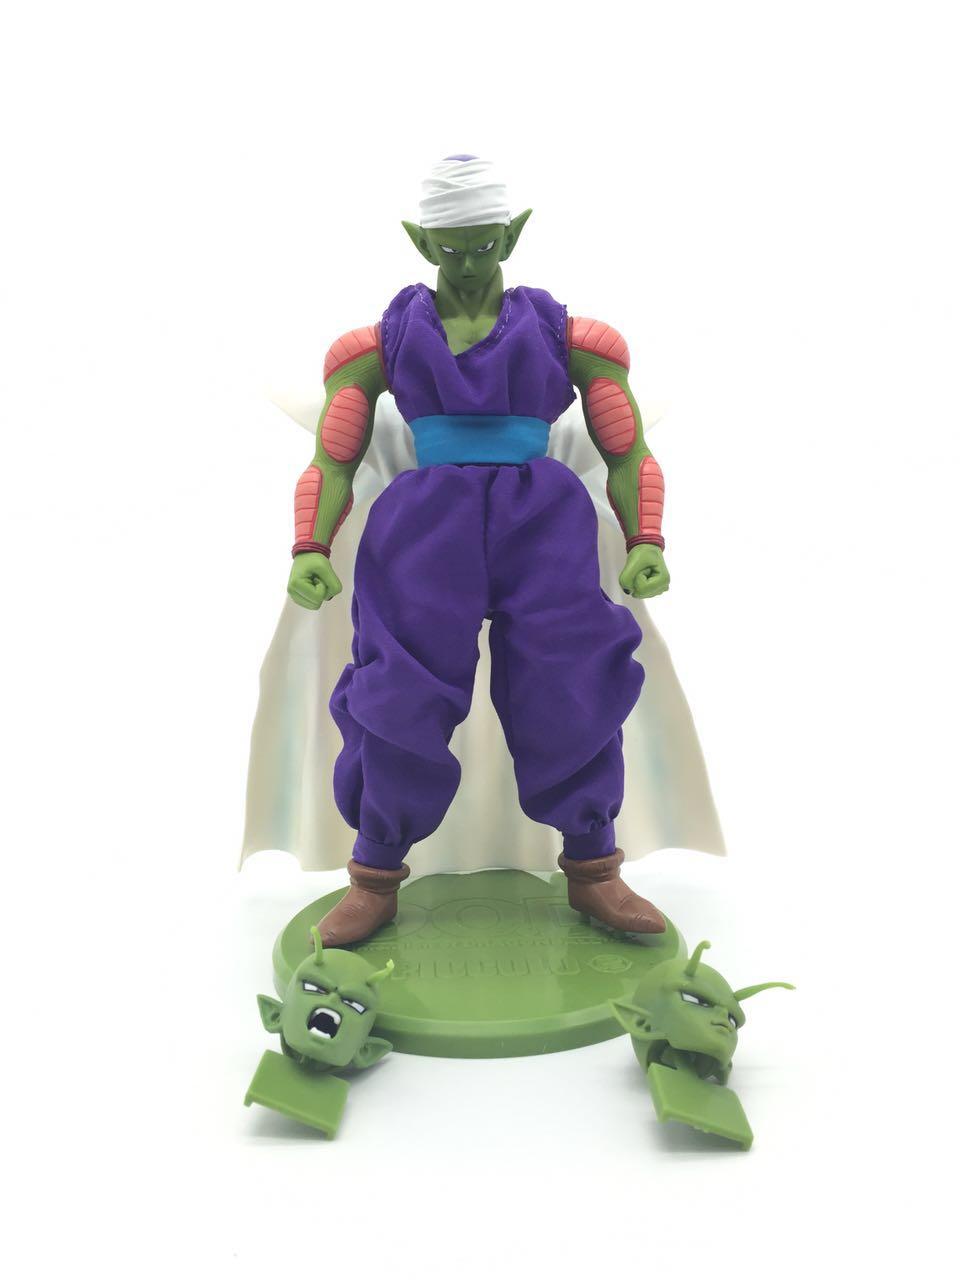 1pcs/set Dragon BallZ DOD Anime Piccolo Super Gotenks Saiyan Son Goku Anime PVC Action Figure Collectible Toy 22CM(China (Mainland))